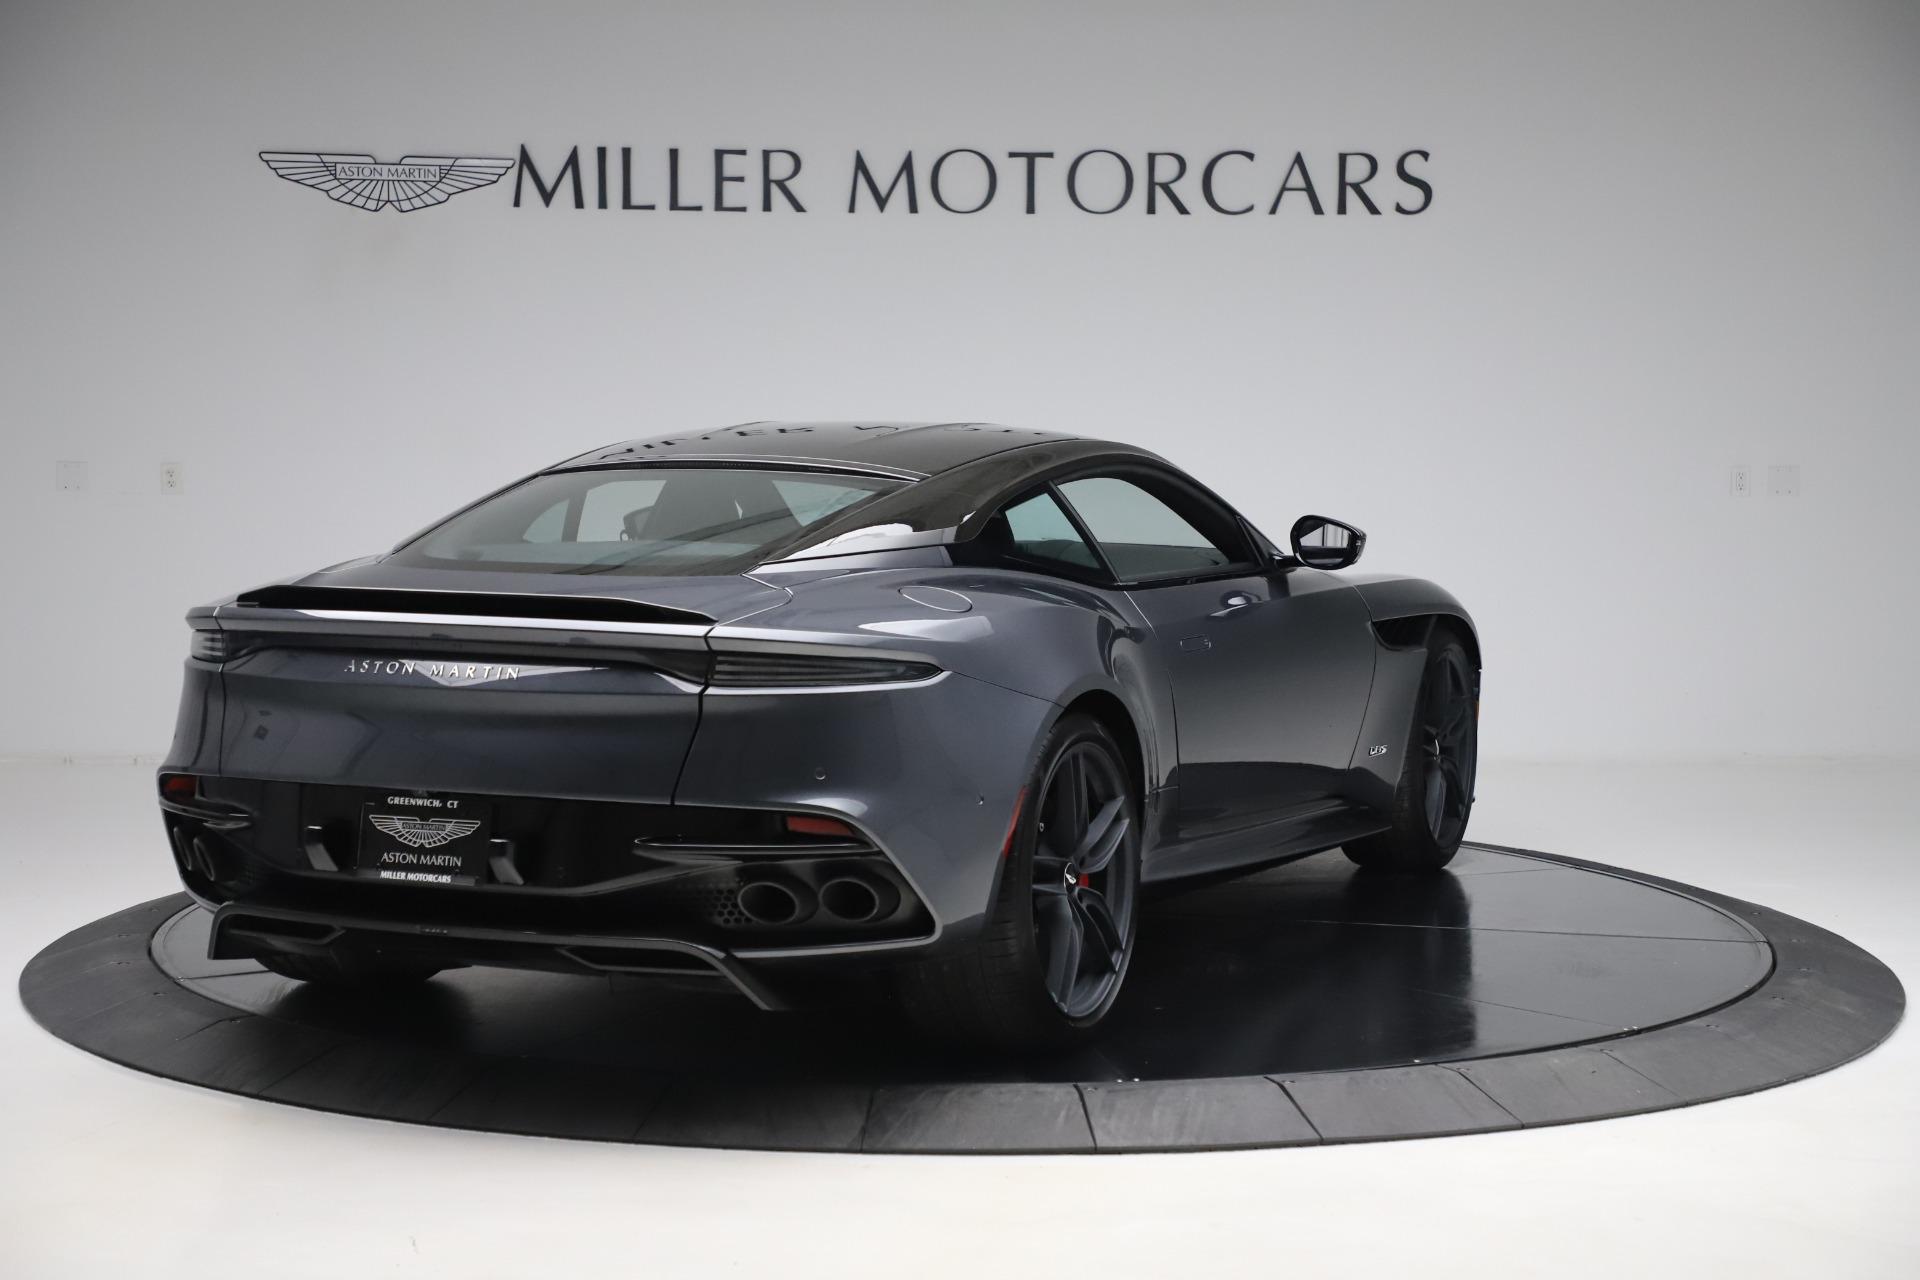 Used 2019 Aston Martin DBS Superleggera Coupe For Sale In Greenwich, CT. Alfa Romeo of Greenwich, A1438B 3570_p7